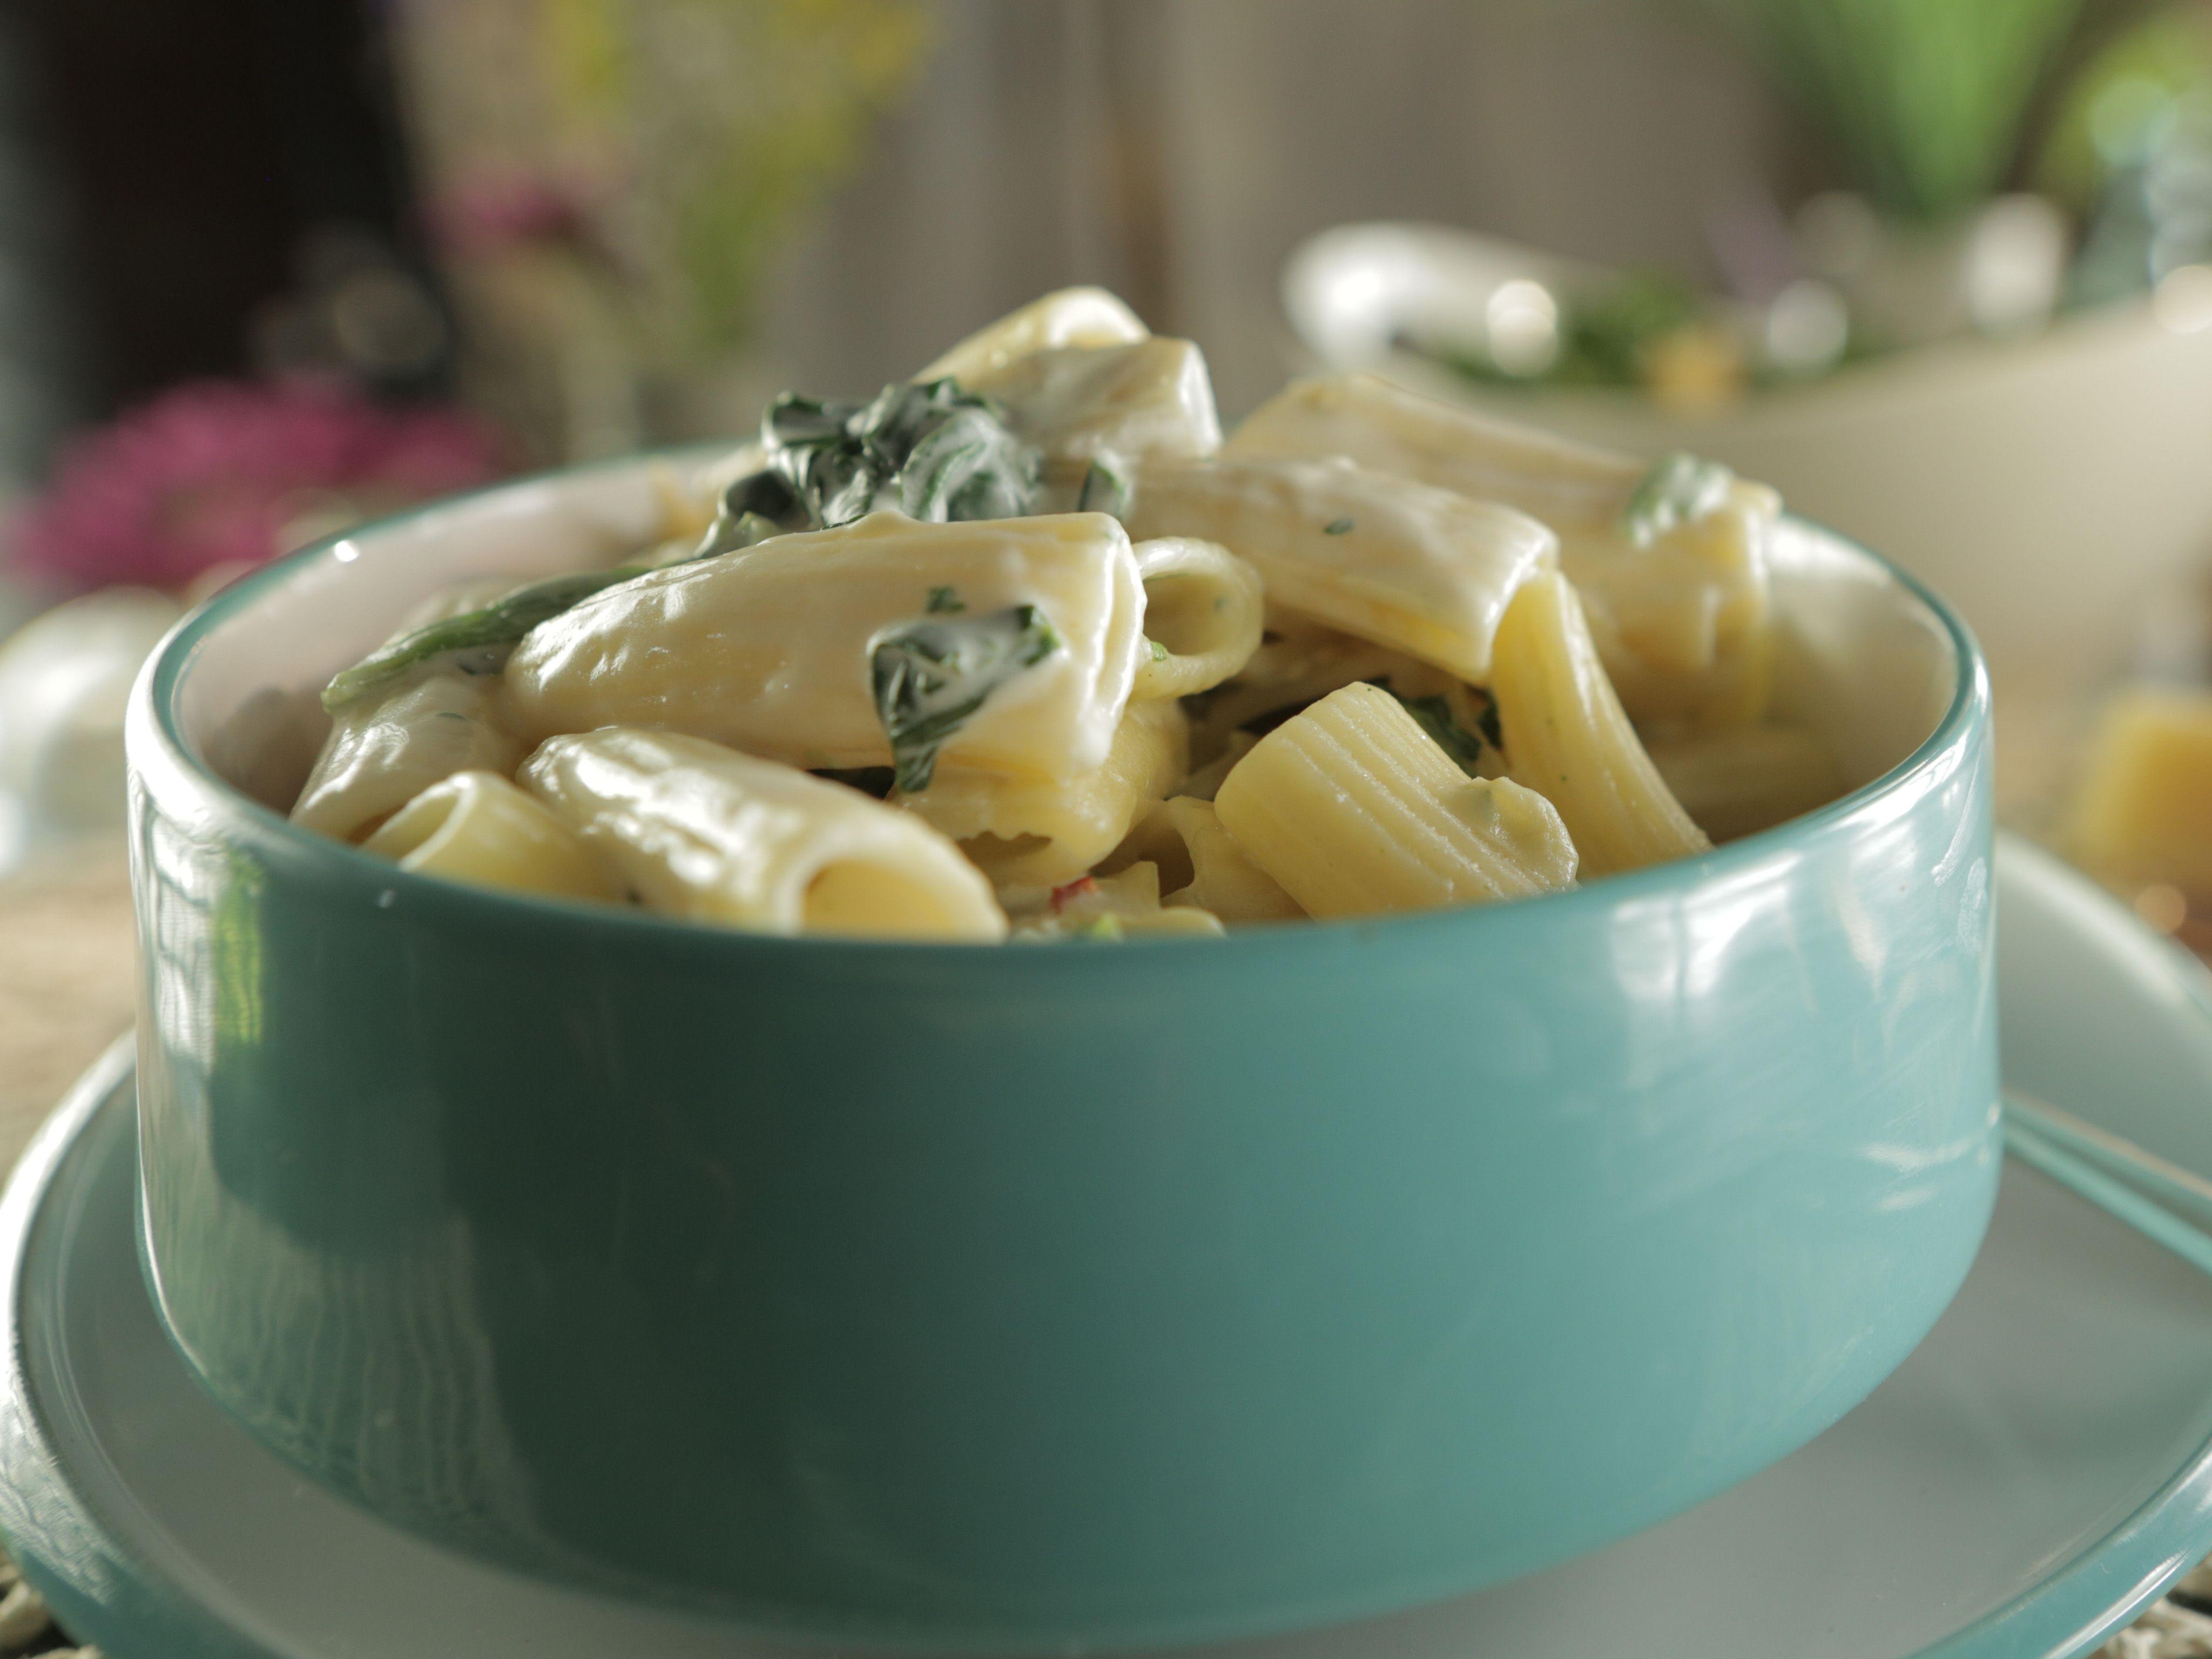 Spinach and artichoke dip pasta receta pasta recetas desayuno y spinach and artichoke dip pasta receta pasta recetas desayuno y la pastilla forumfinder Images